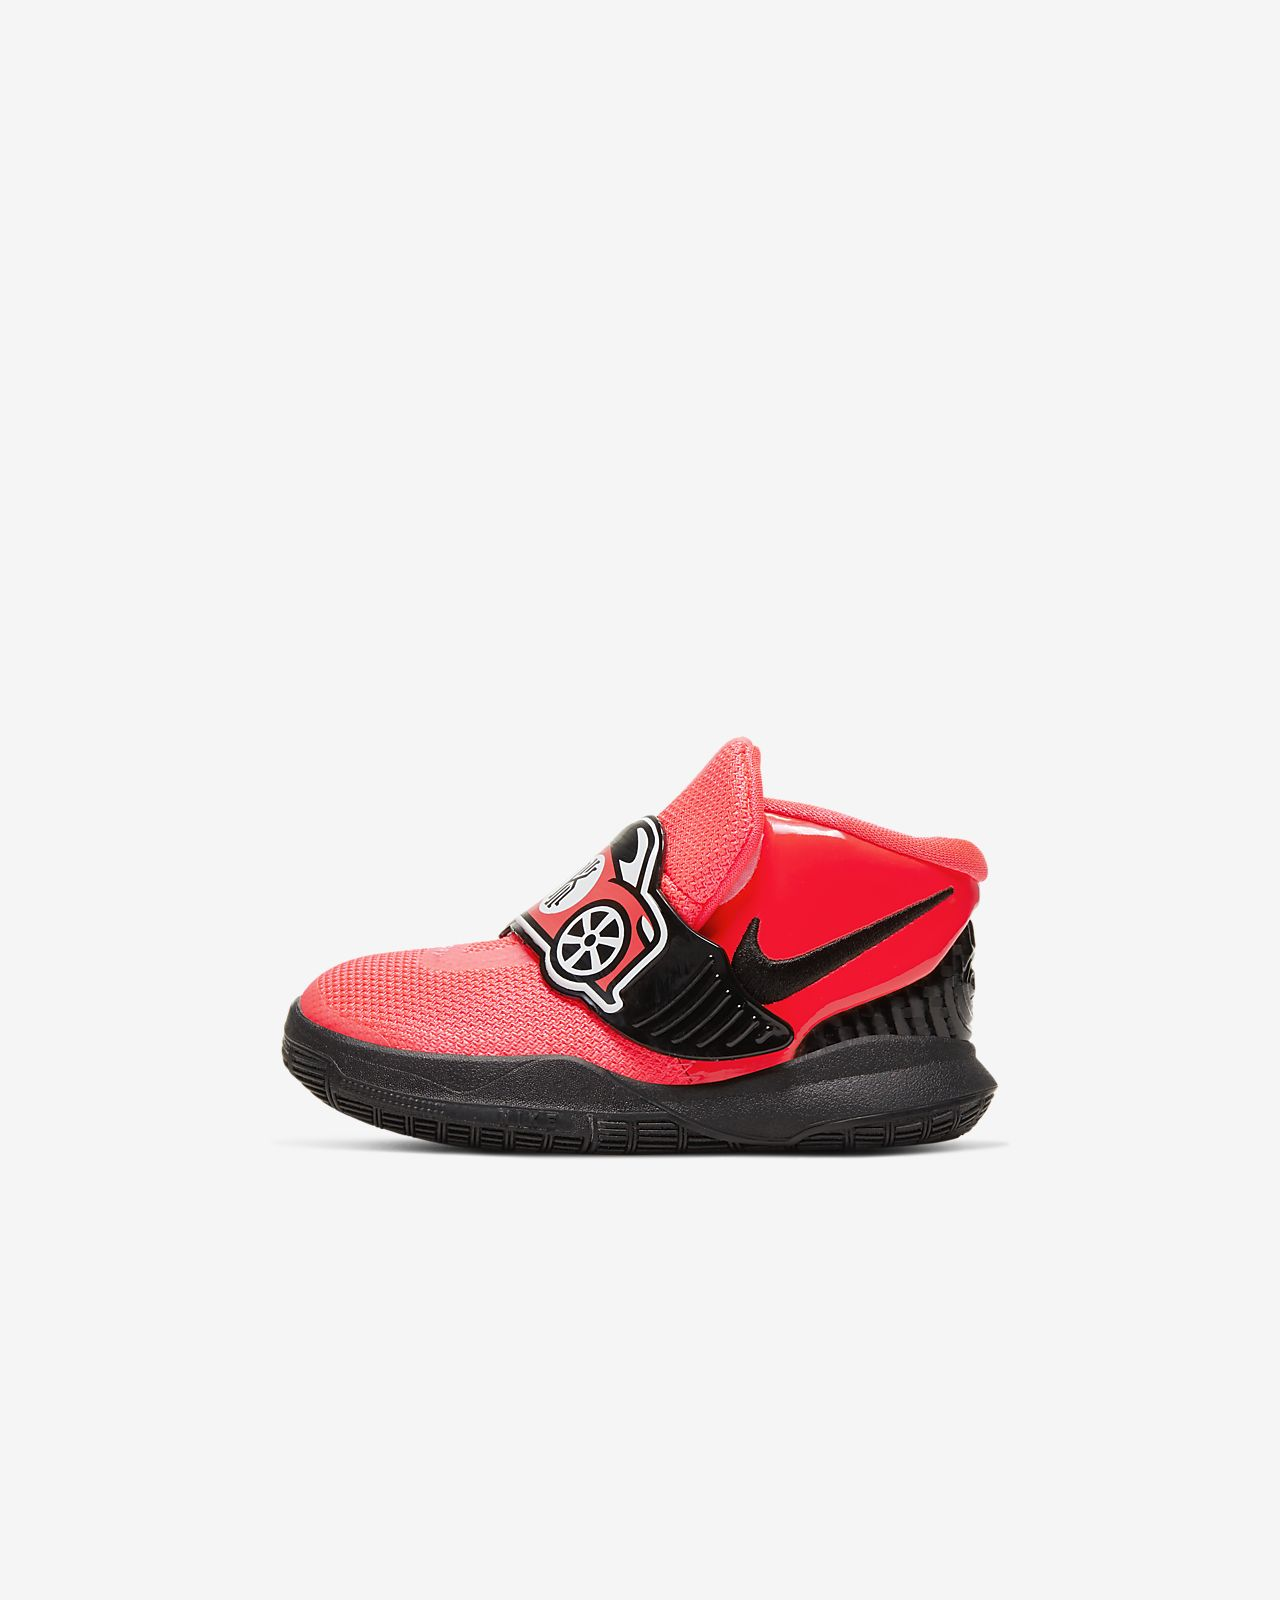 Kyrie 6 Super Vroom Baby/Toddler Shoe